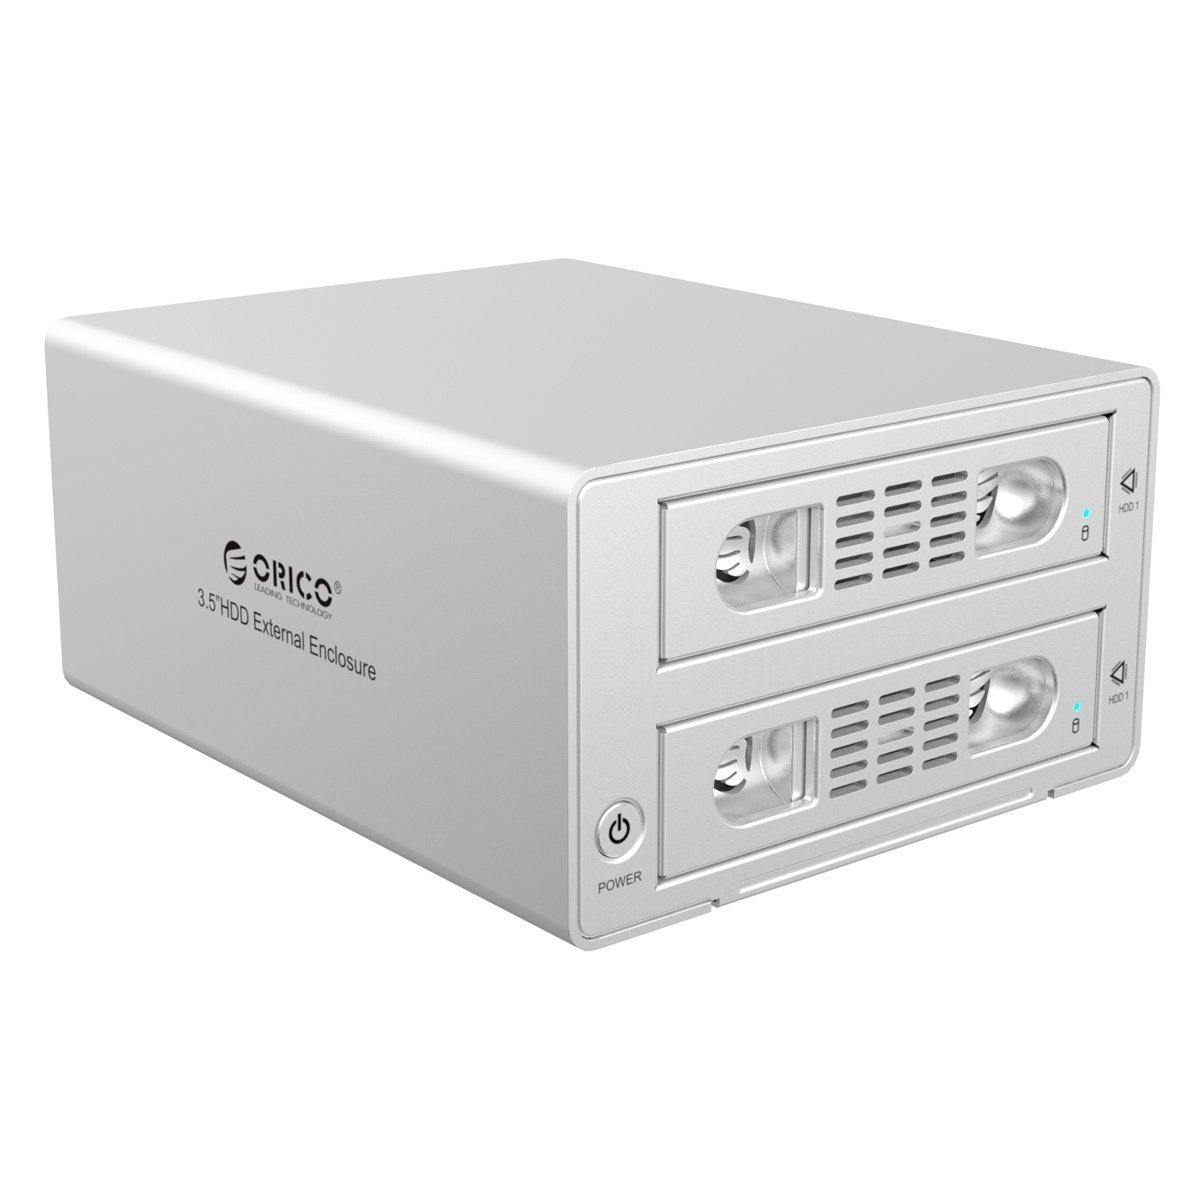 Buy Orico 3529nas Dual Bay Sata Raid Rj 45 Usb 30 Network Lan 6629us3 C To External Hdd Docking Station 35 Hard Disk Esata 0 1 Silver 3529rus3